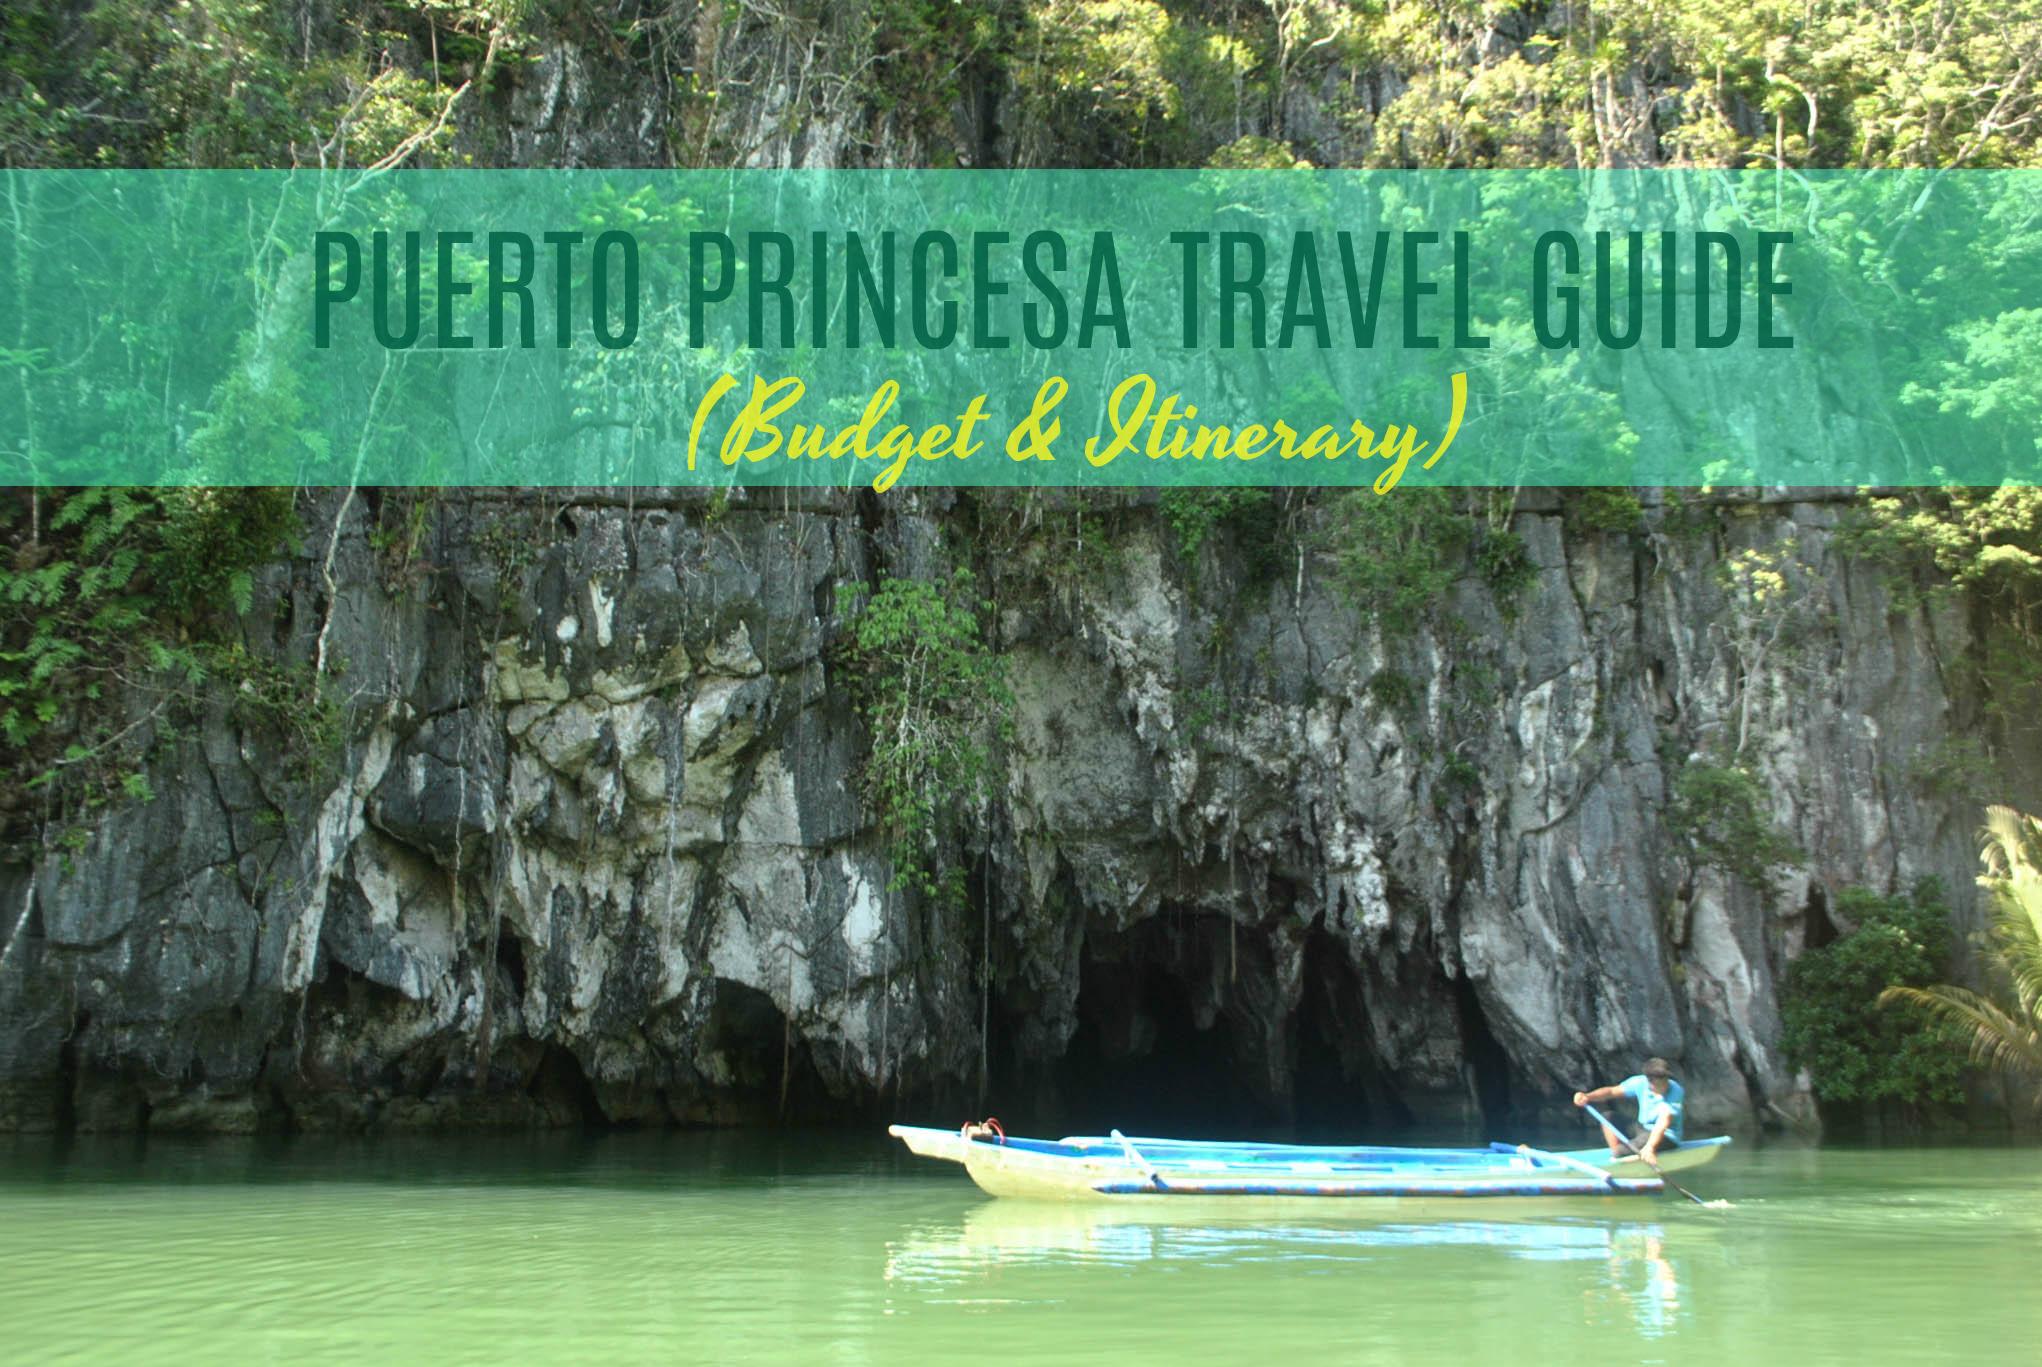 PUERTO PRINCESA TRAVEL GUIDE 2019 (Budget + Itinerary)